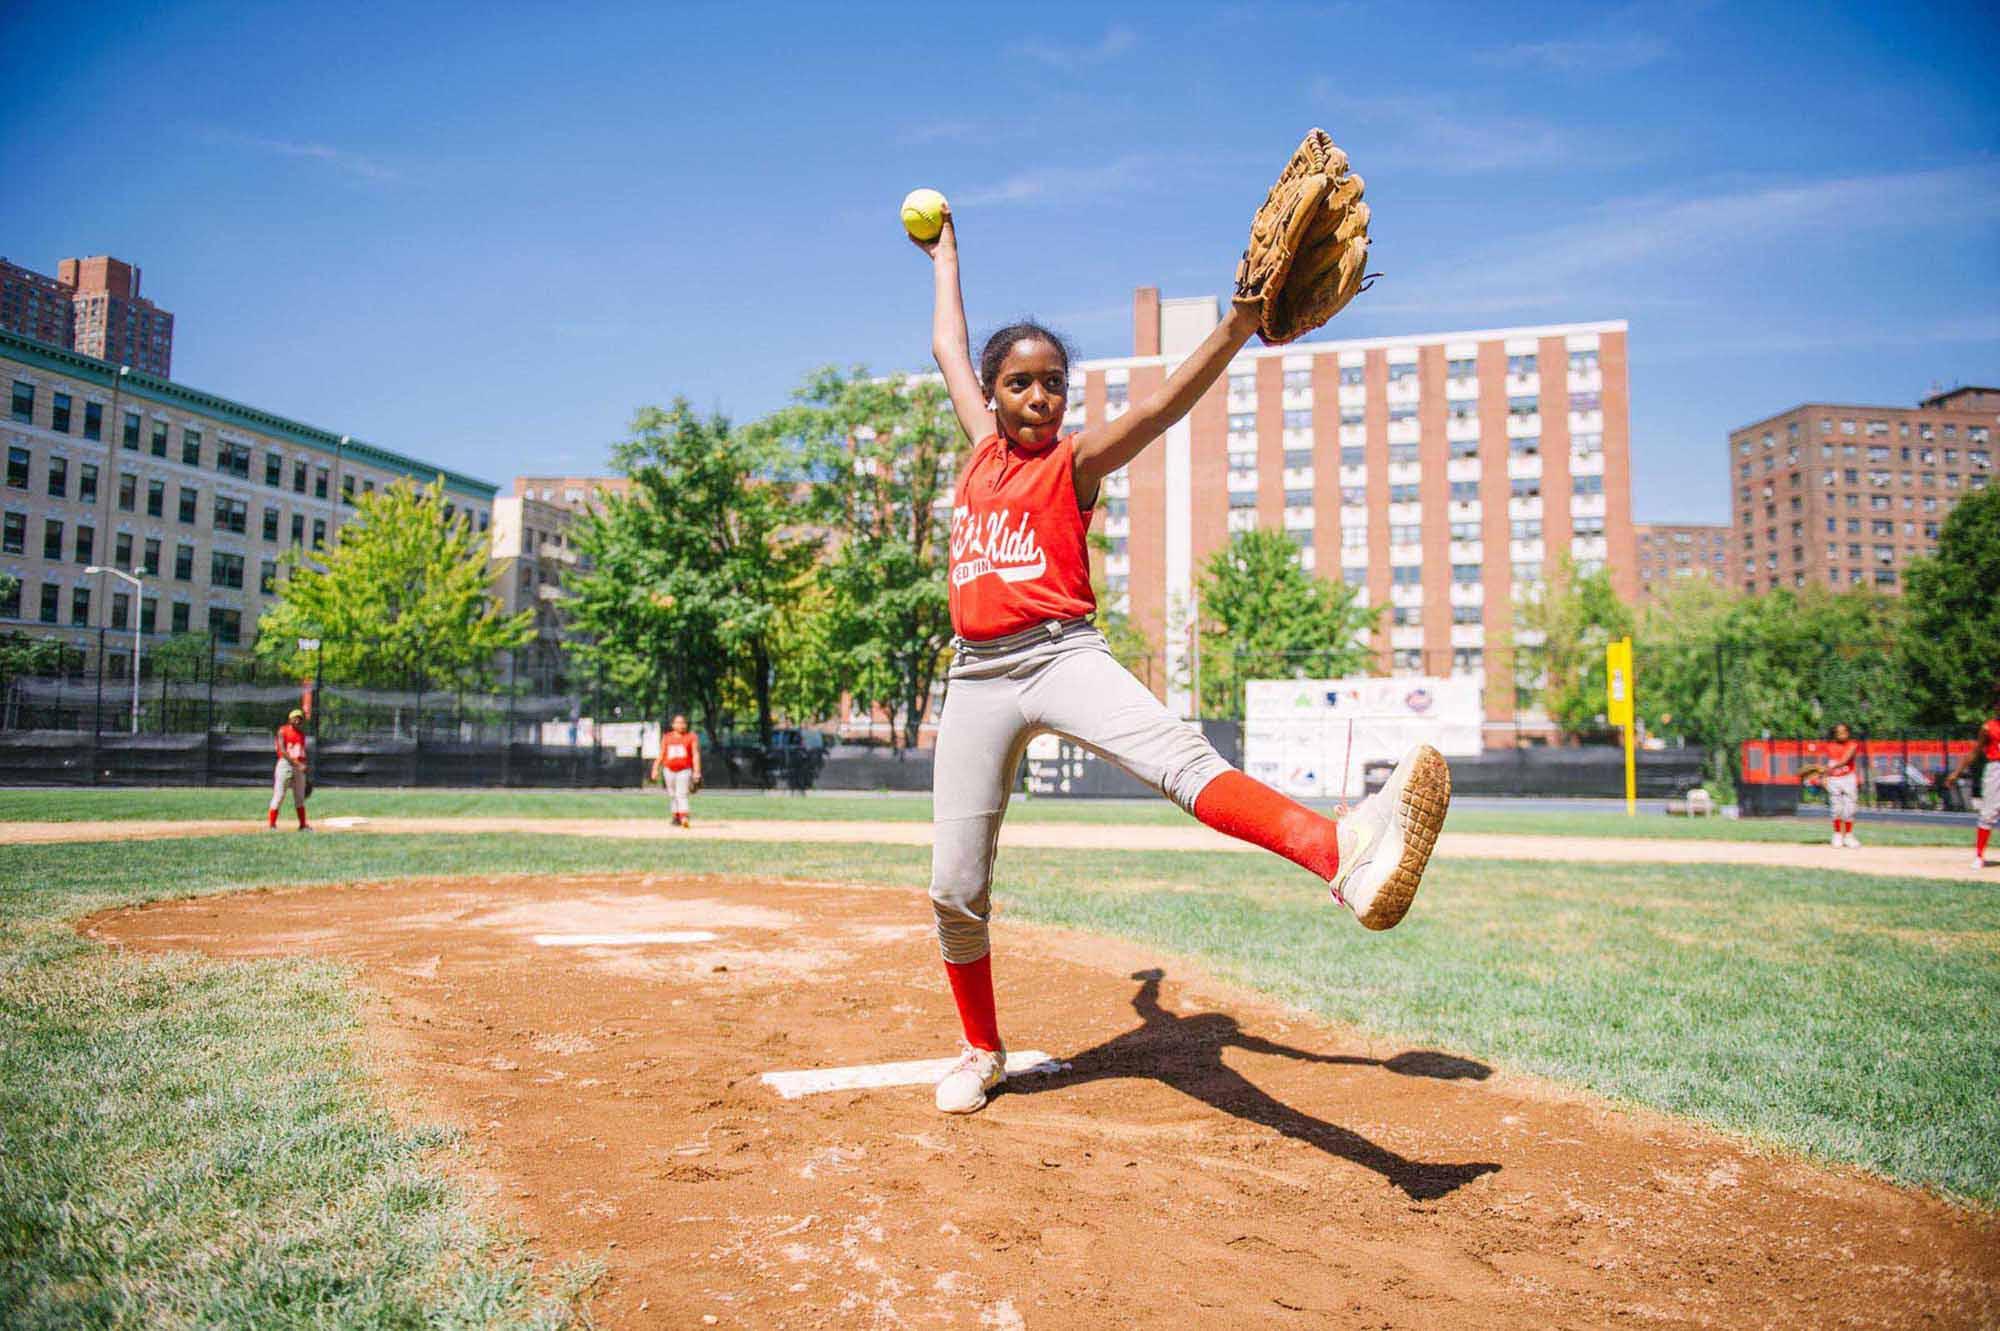 Why Children Like to Play Baseball